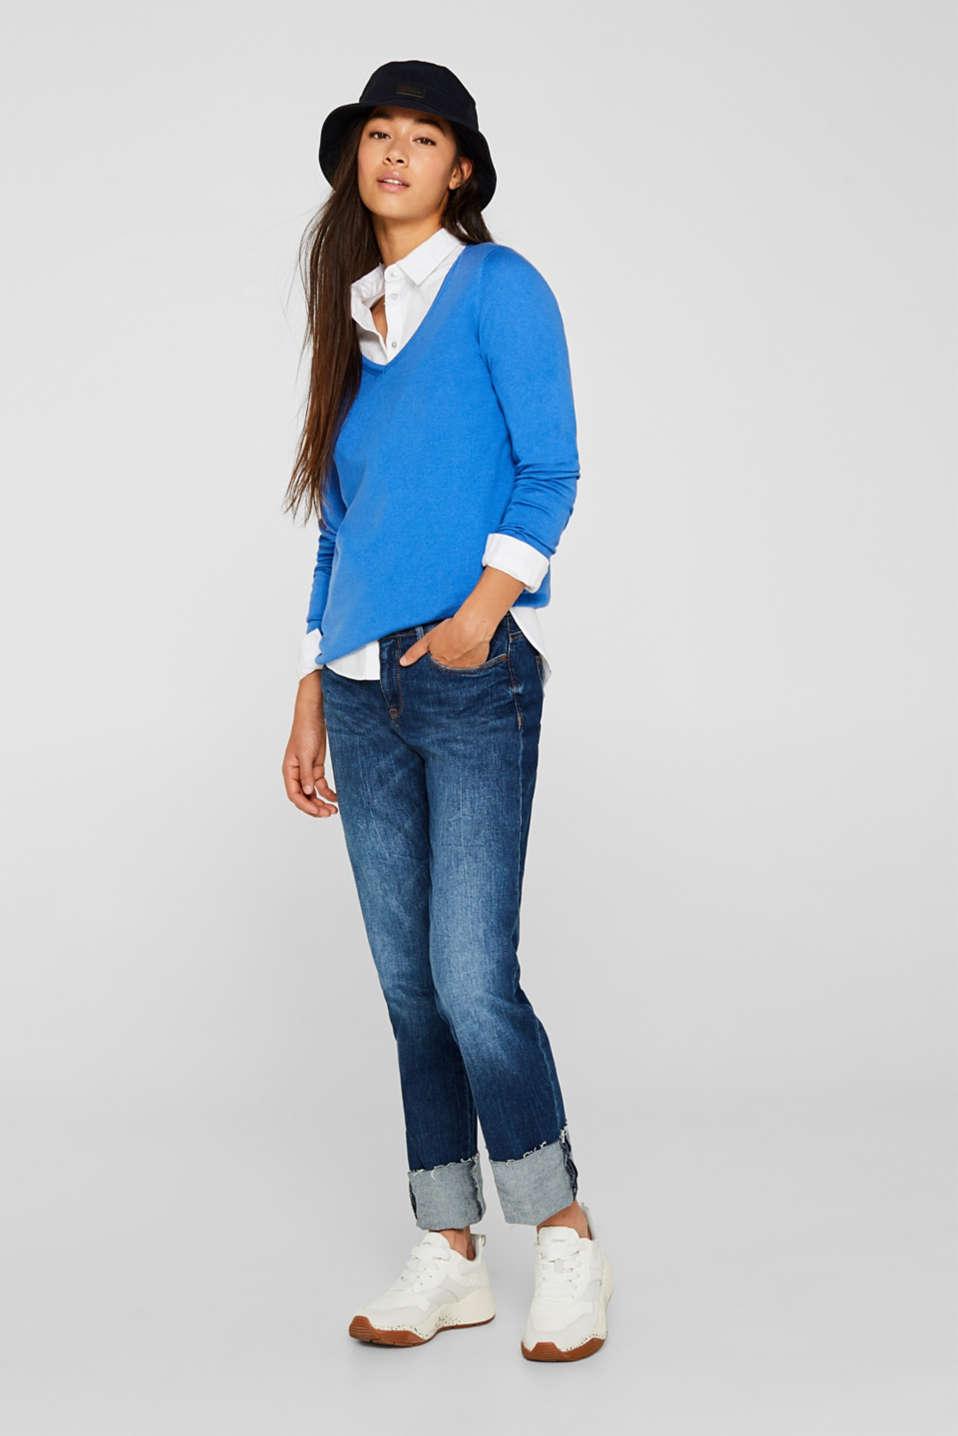 Jumper, organic cotton, BRIGHT BLUE, detail image number 1